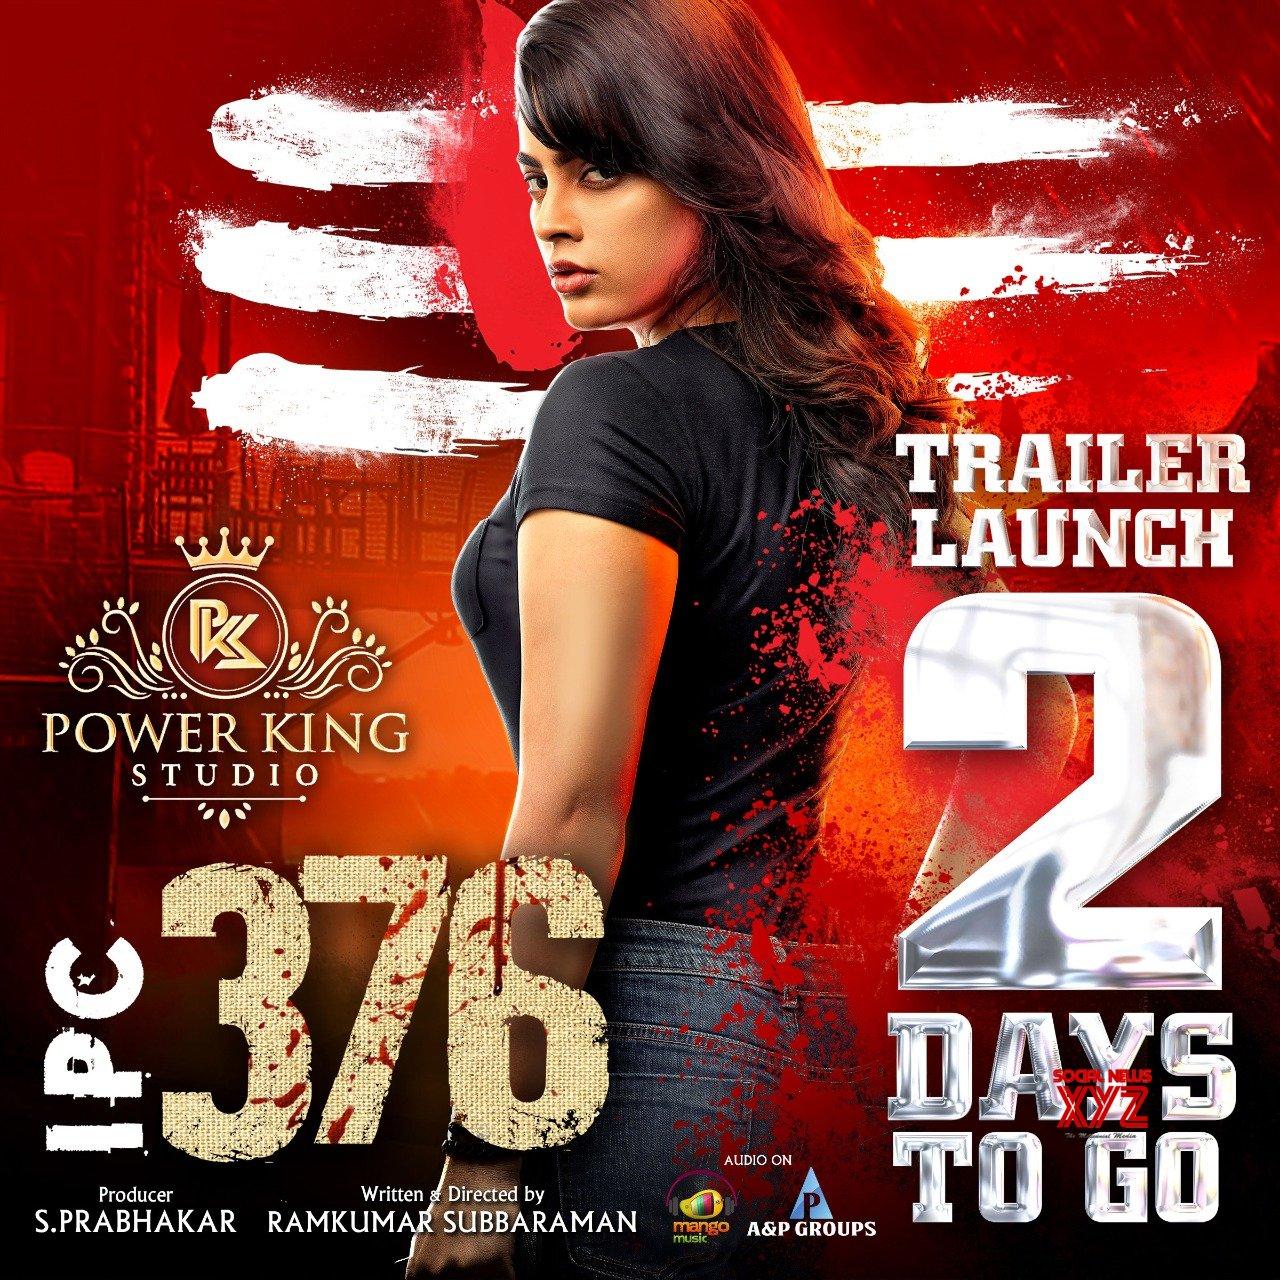 Nandita Swetha's IPC 376 Movie Trailer 2 Days To Go Poster